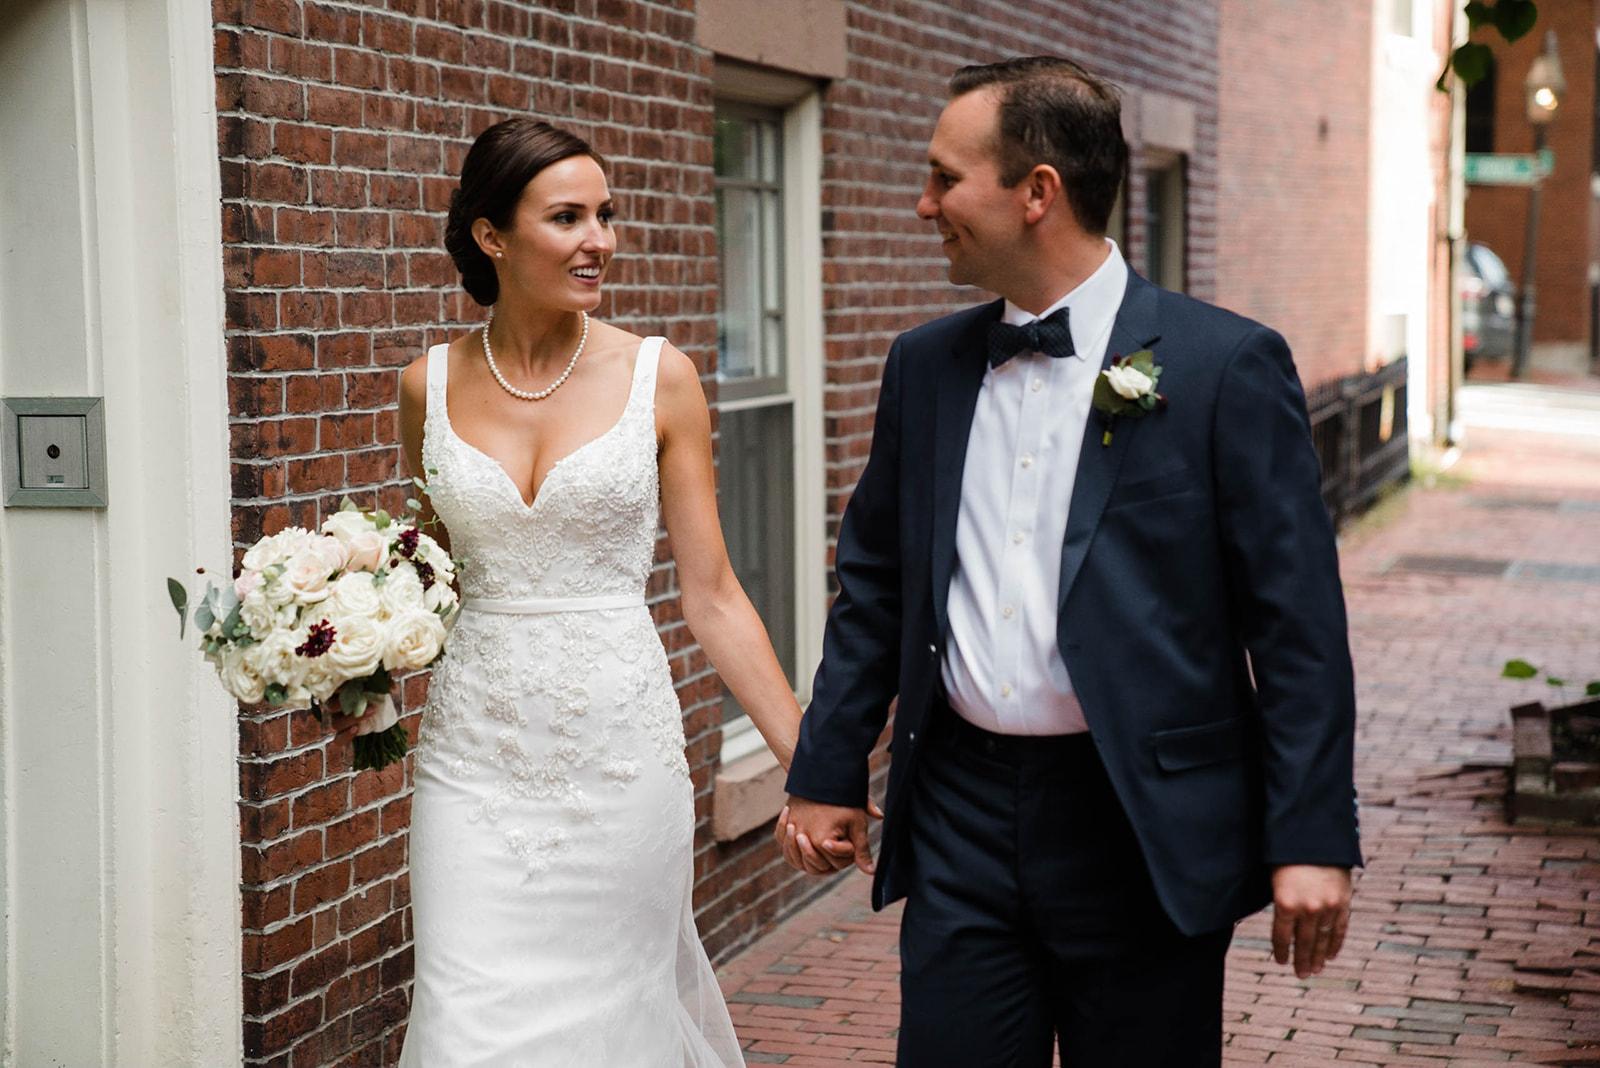 wedding-flowers-state-room-boston-lesfleurs (7).jpg